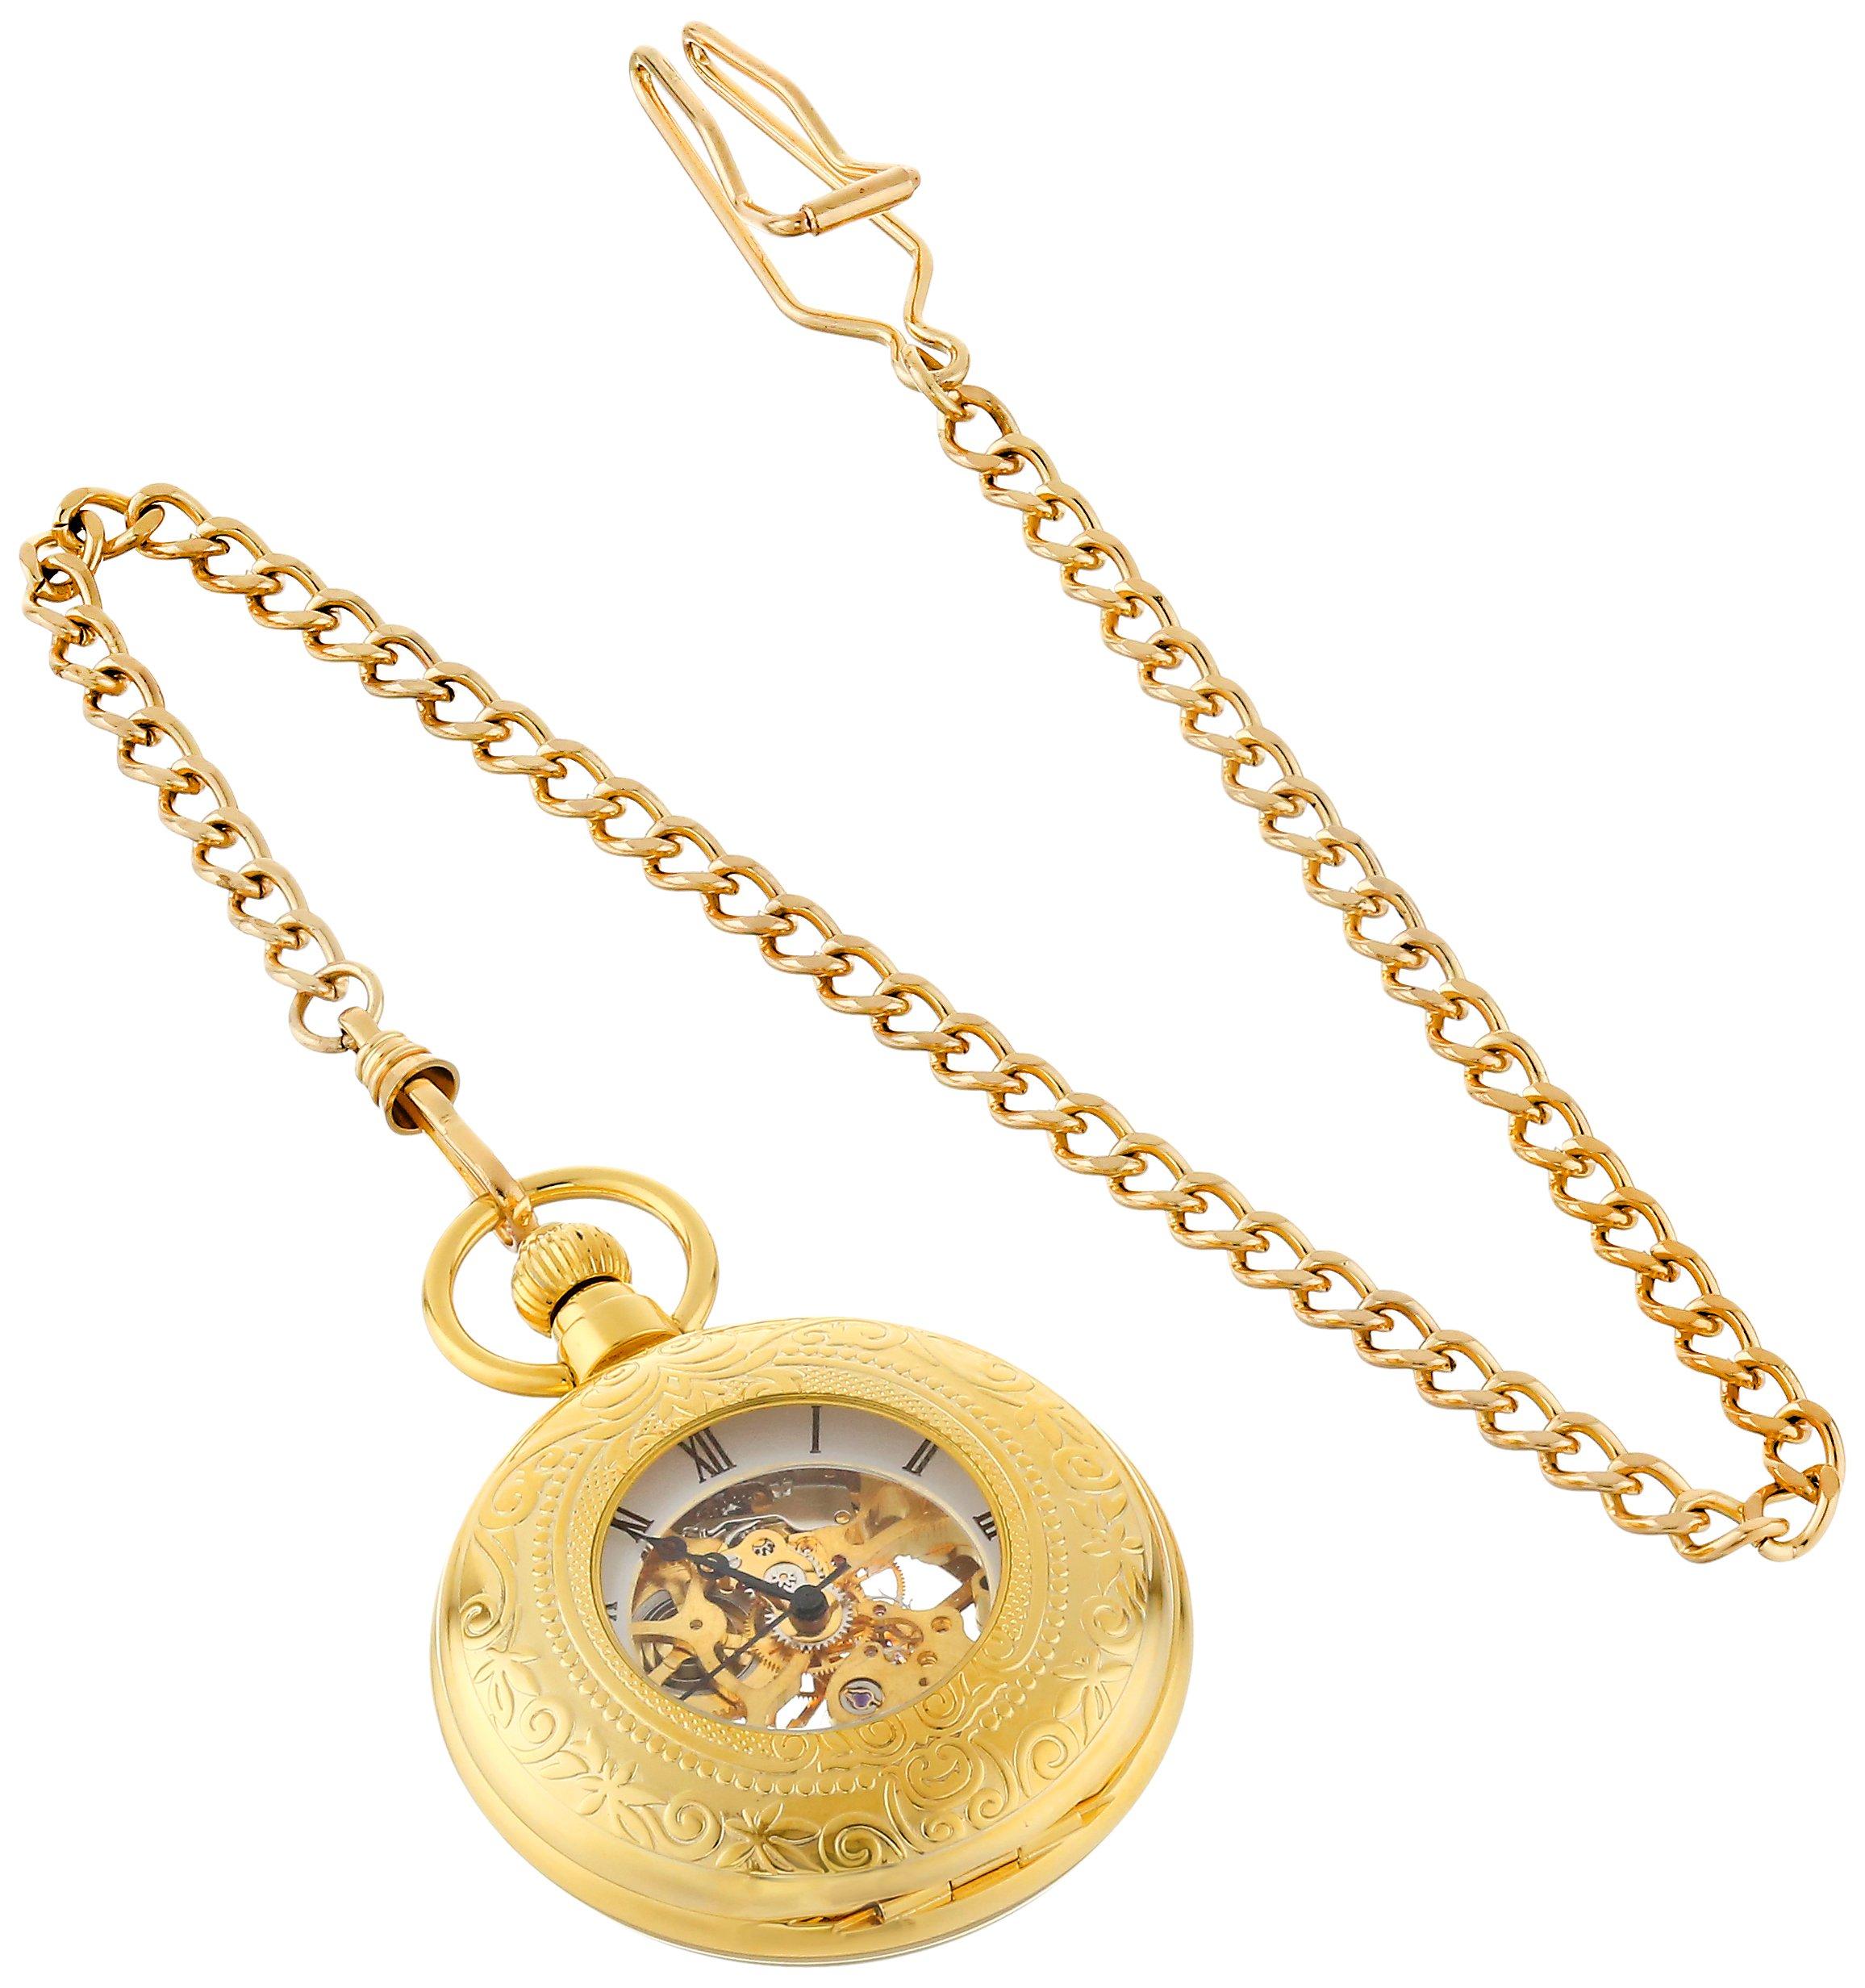 Charles-Hubert, Paris Gold-Plated Mechanical Pocket Watch by CHARLES-HUBERT PARIS (Image #3)